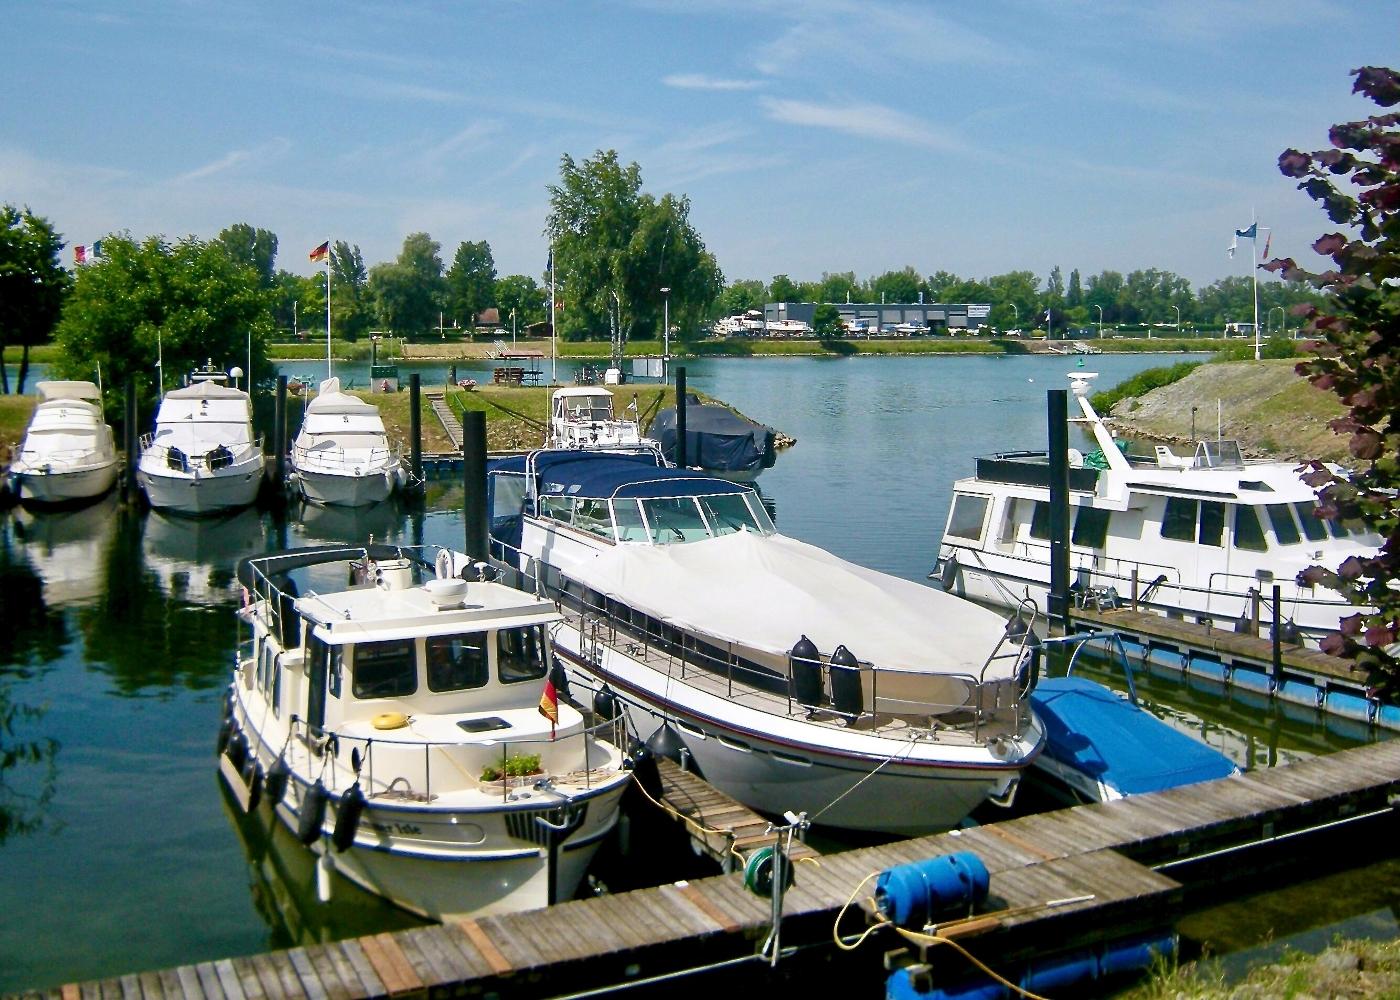 2001 Nordic Tugs 32 Pilothouse, Rhine River, Germany